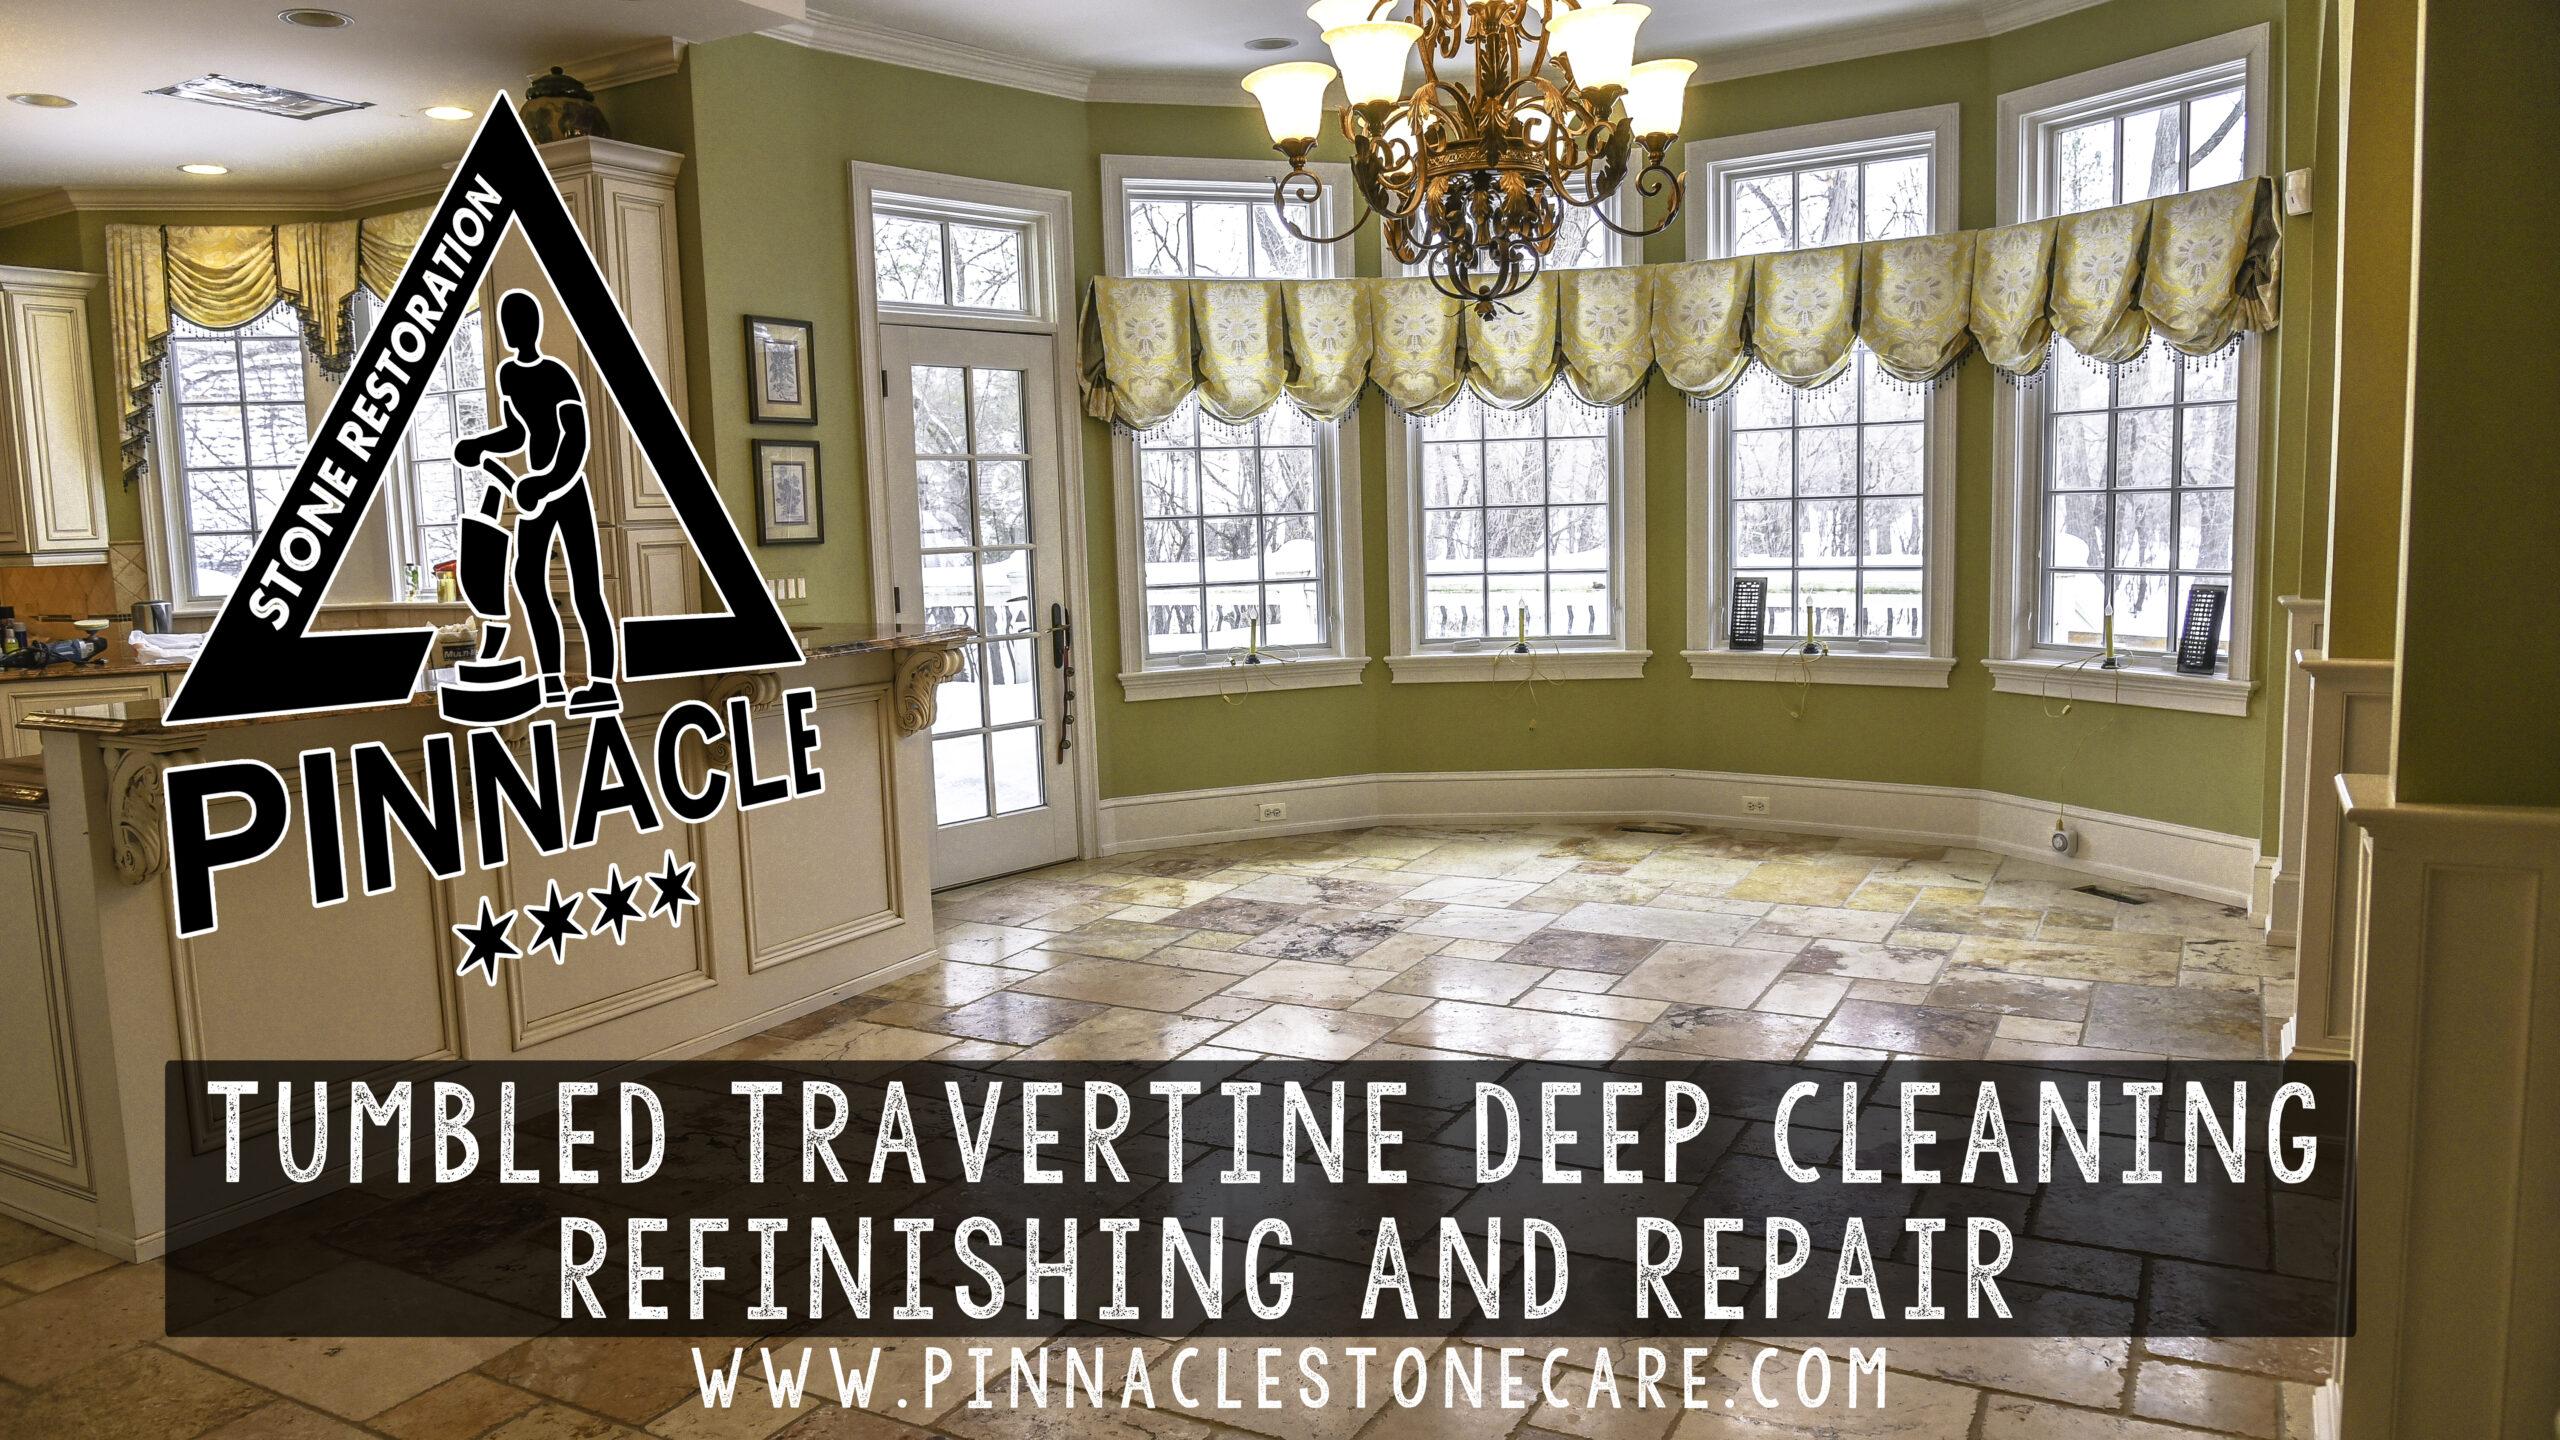 TUMBLED TRAVERTINE DEEP CLEANING, REFINISHING, AND REPAIR